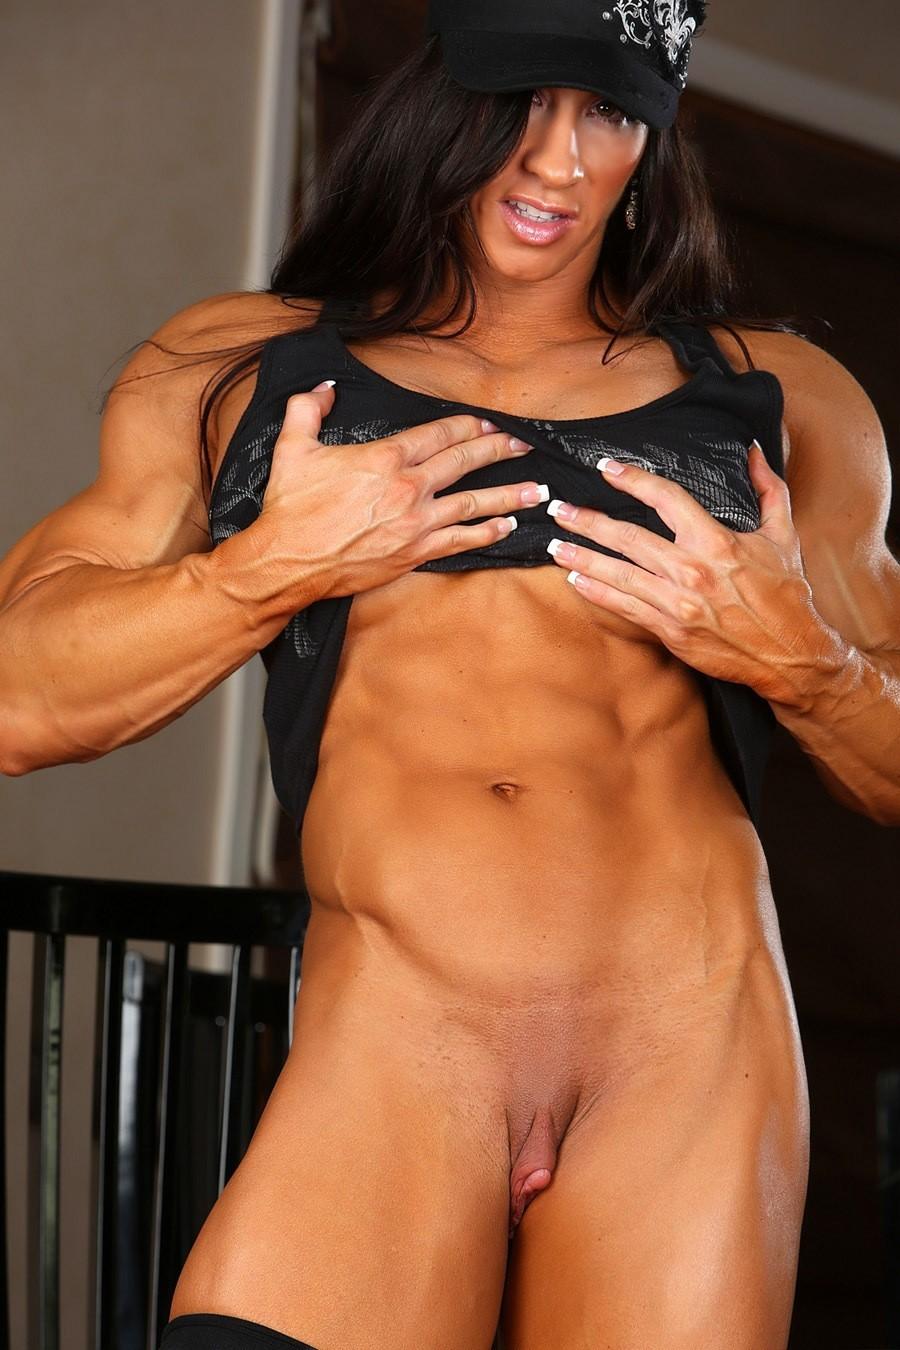 Angela Salvagno - Галерея 3422160